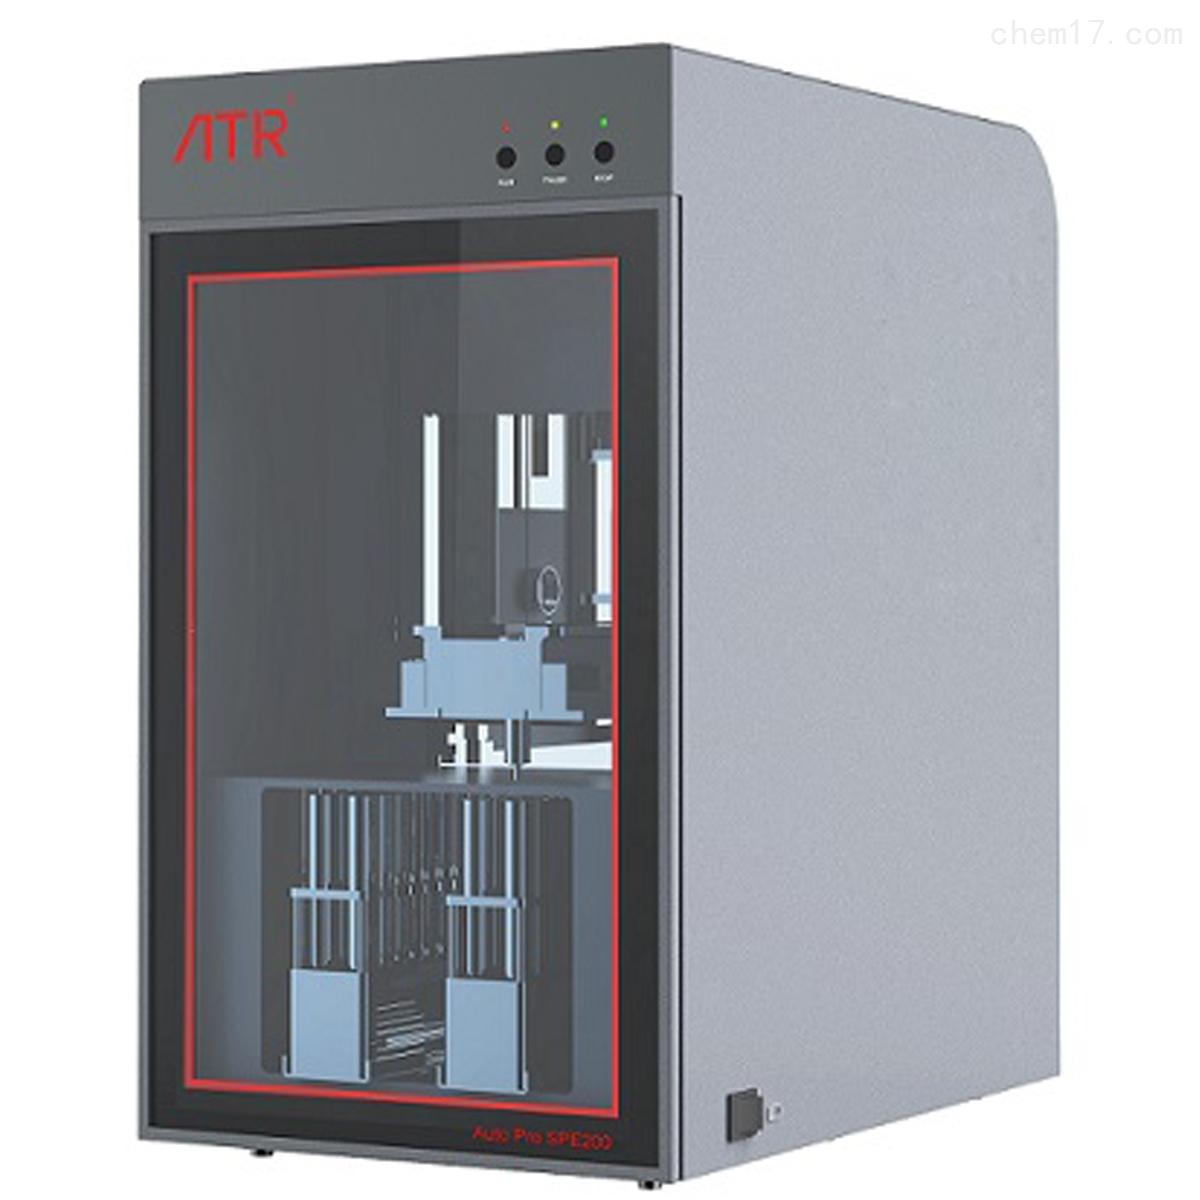 ATR 高通量固相萃取仪